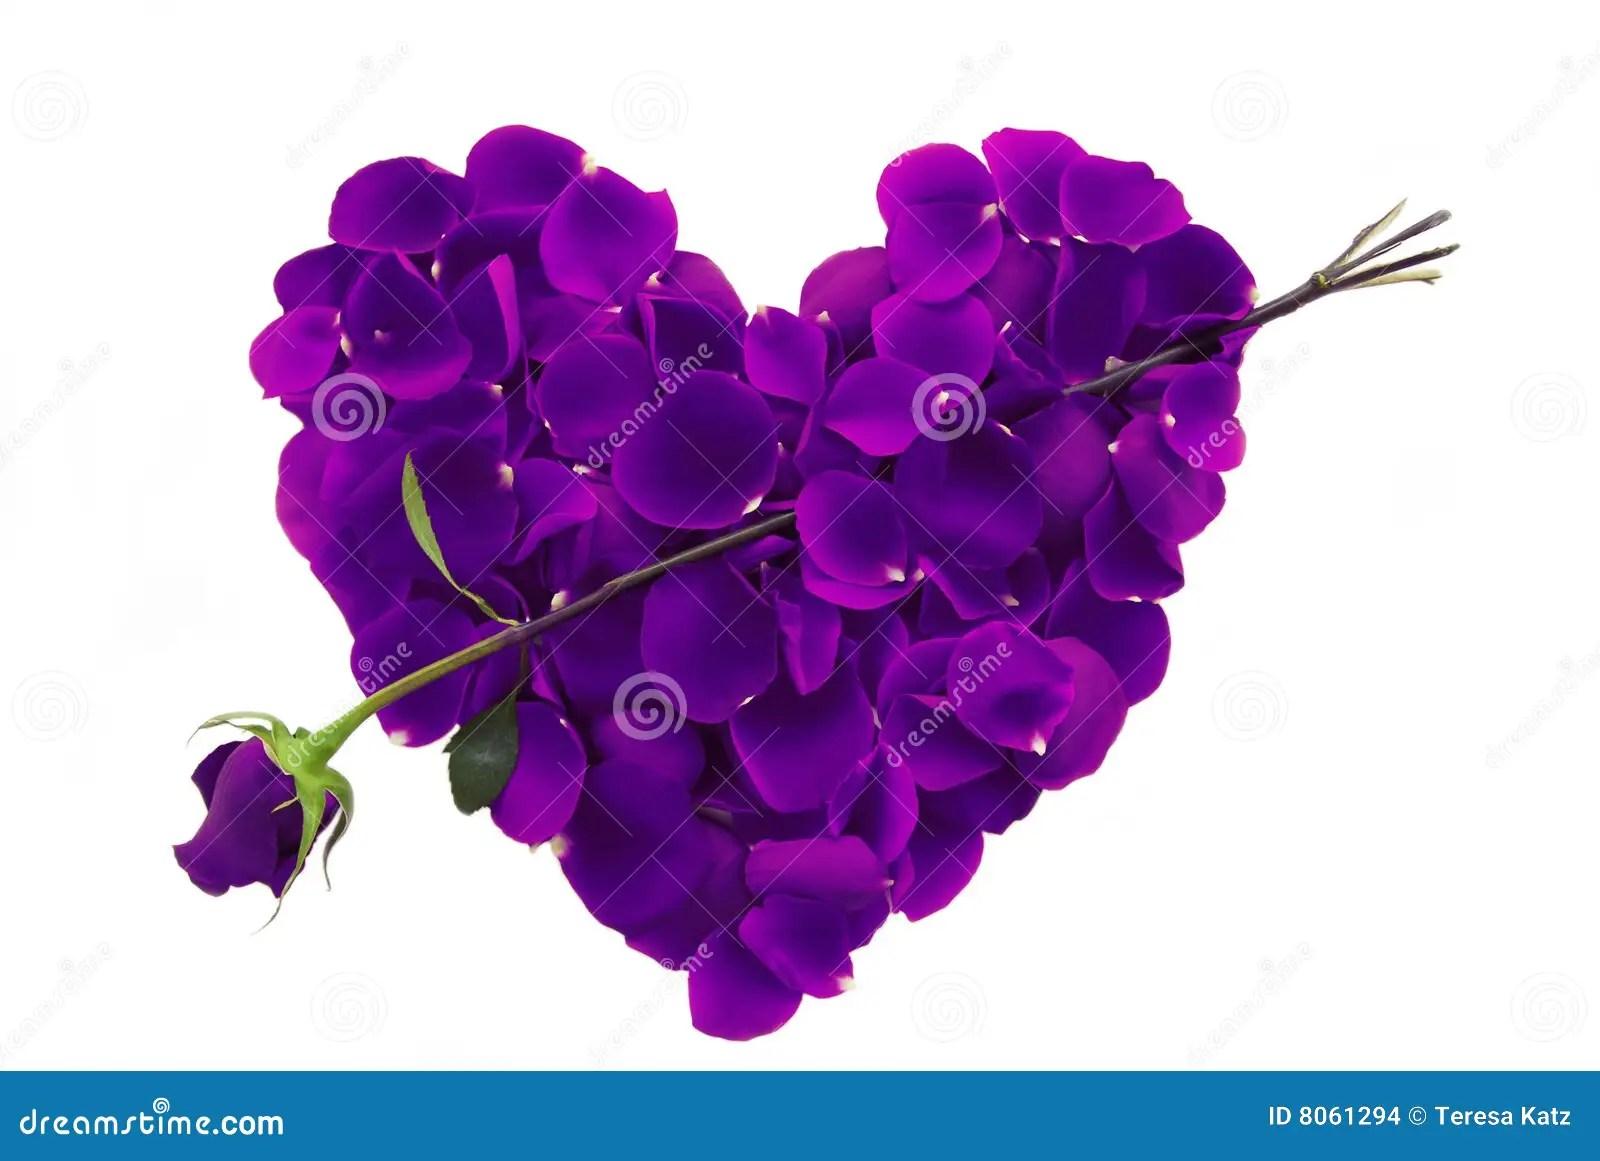 purple rose petal heart